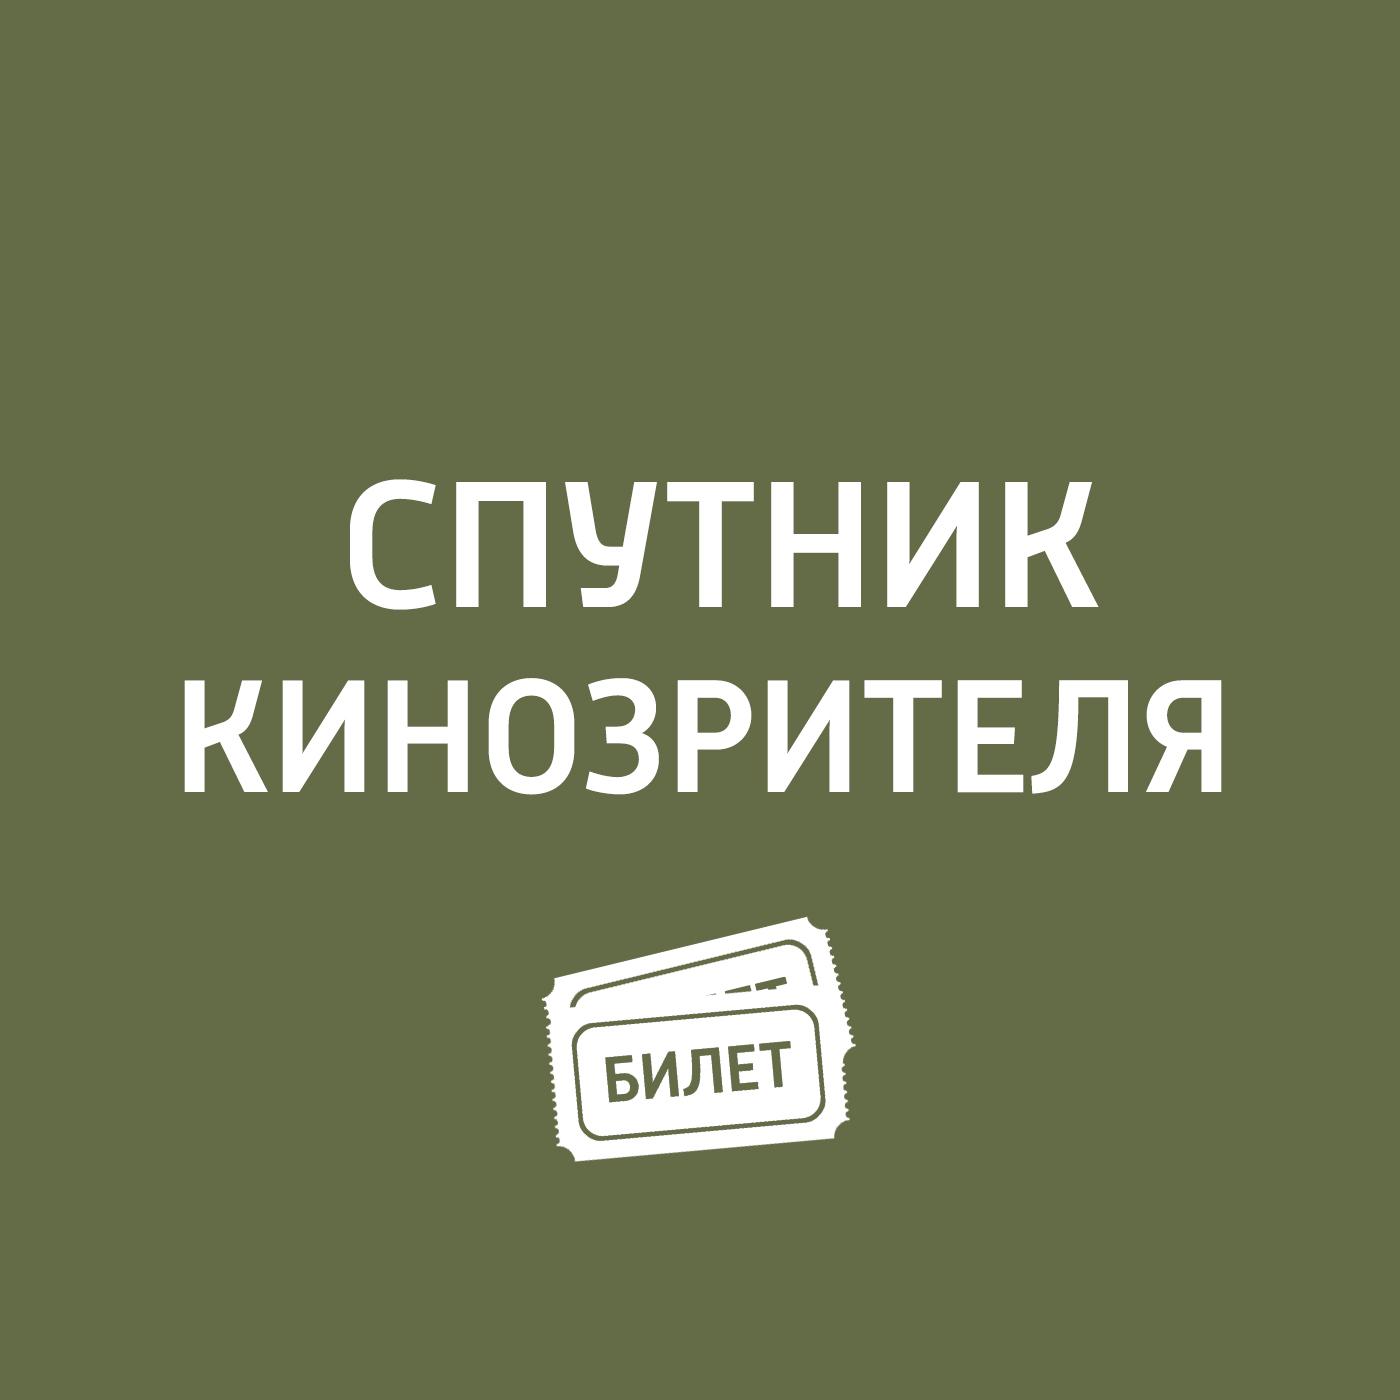 Антон Долин Берлинале 2016. Да здравствует Цезарь! антон долин сансет бульвар